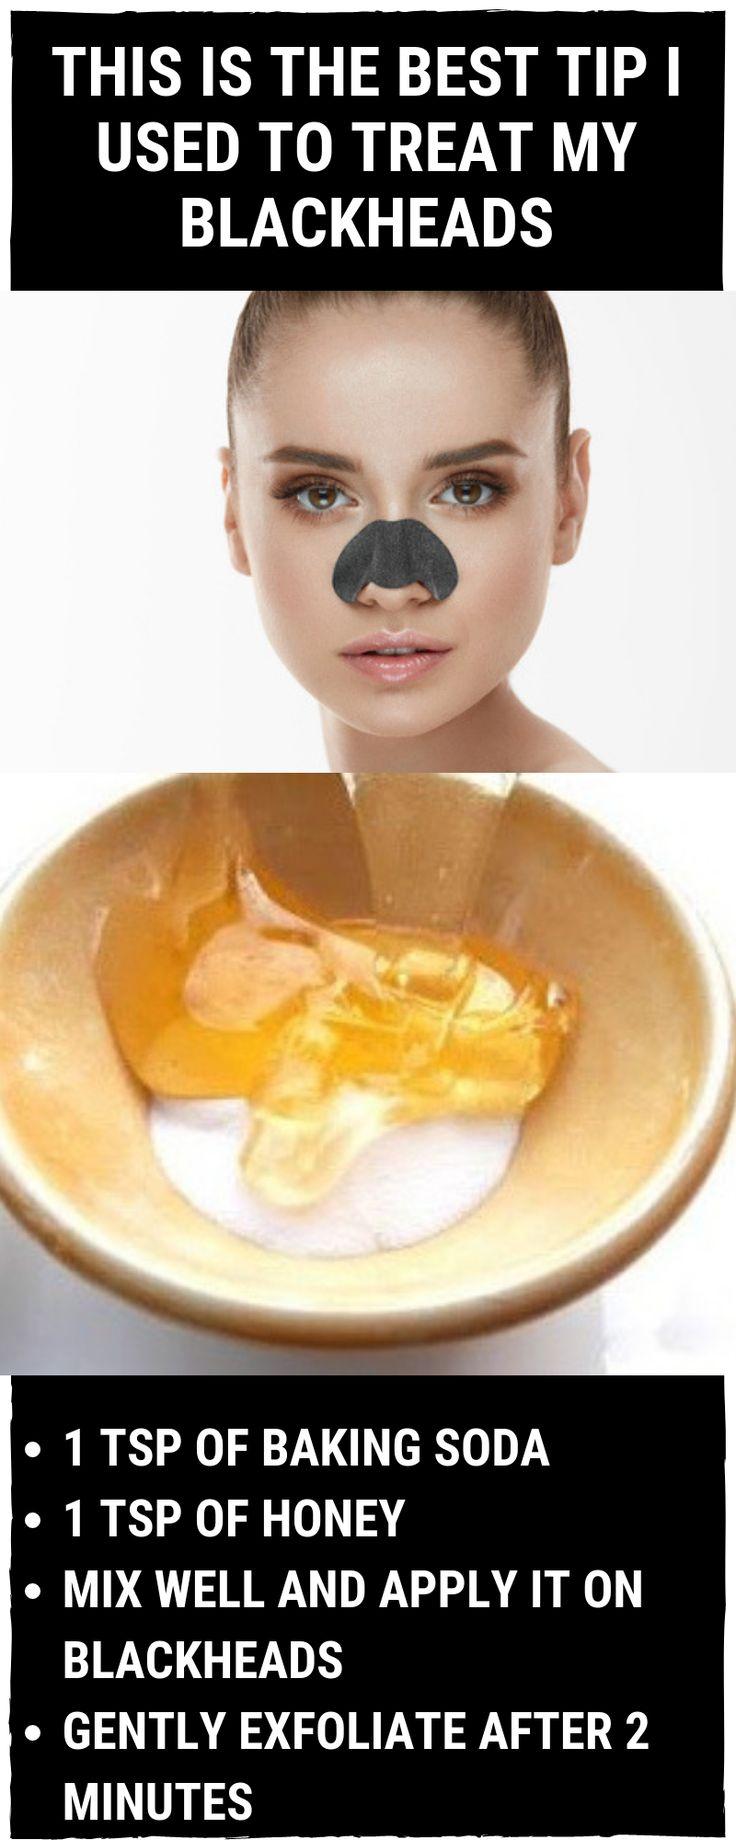 How To Use Honey To Get Rid Of Blackheads #blackheads#blackheadspopping #skincare #skin #homeremedies